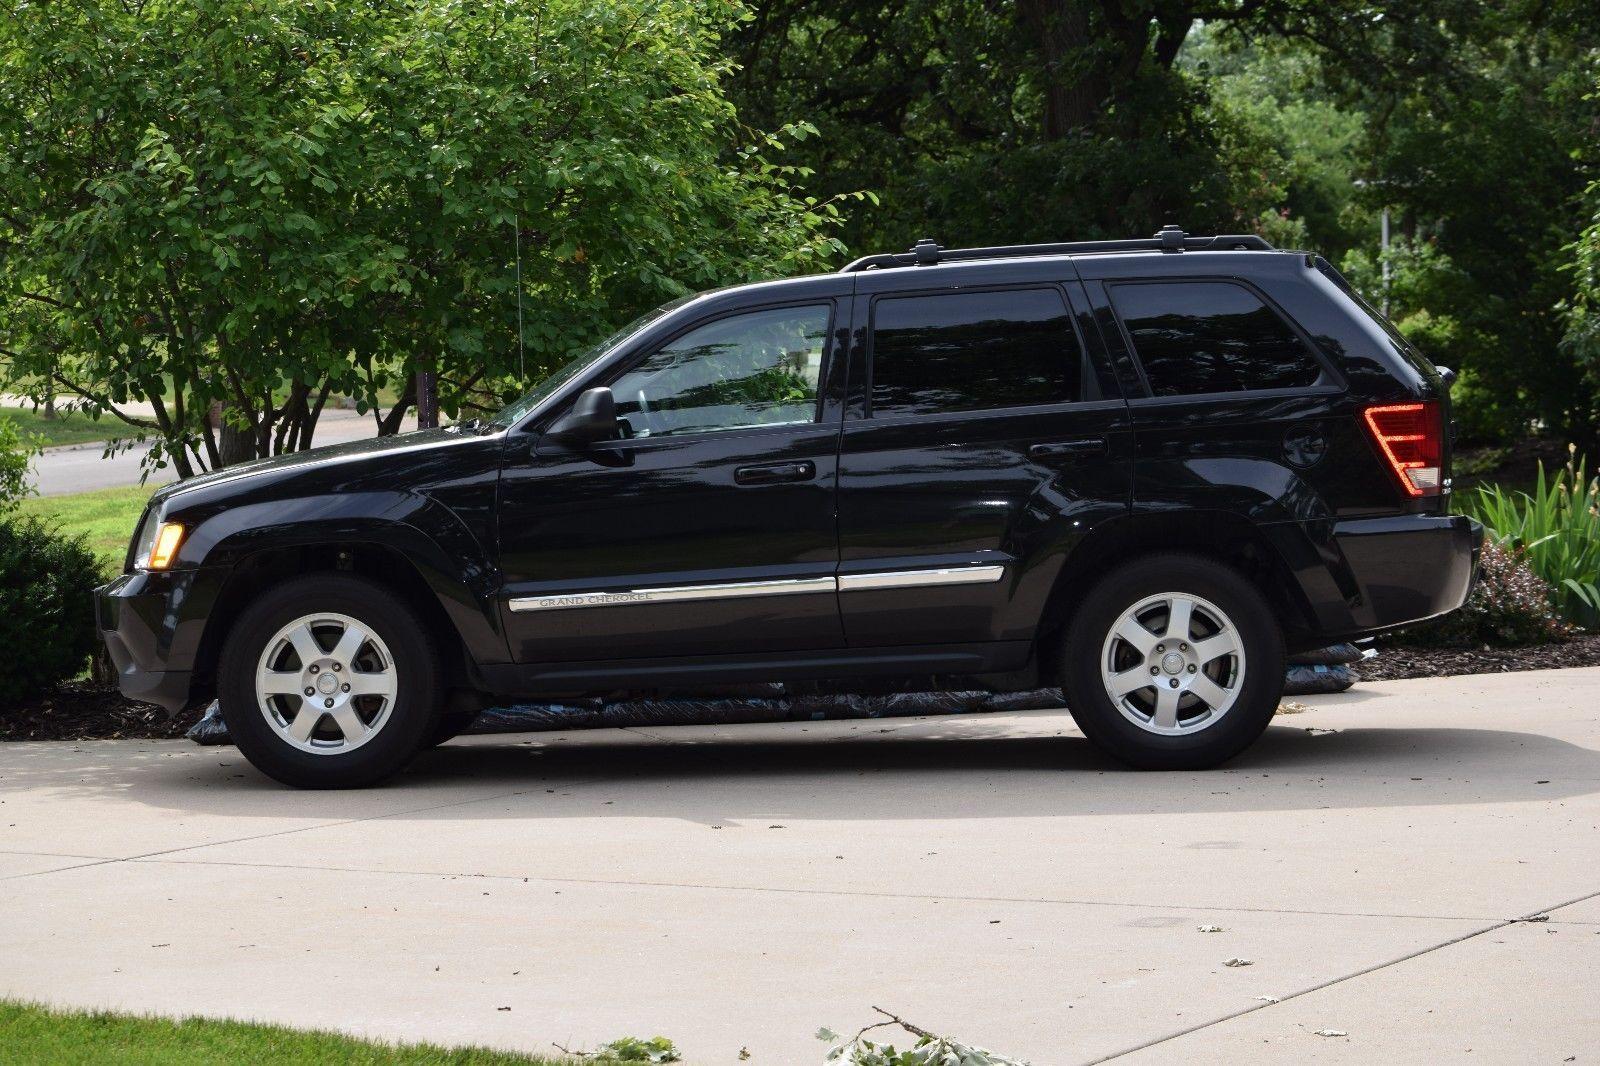 Superb EBay: 2010 Jeep Grand Cherokee LAREDO ONE OWNER  CLEAN 2010 Jeep Grand  Cherokee Laredo 4WD BLACK #jeep #jeeplife